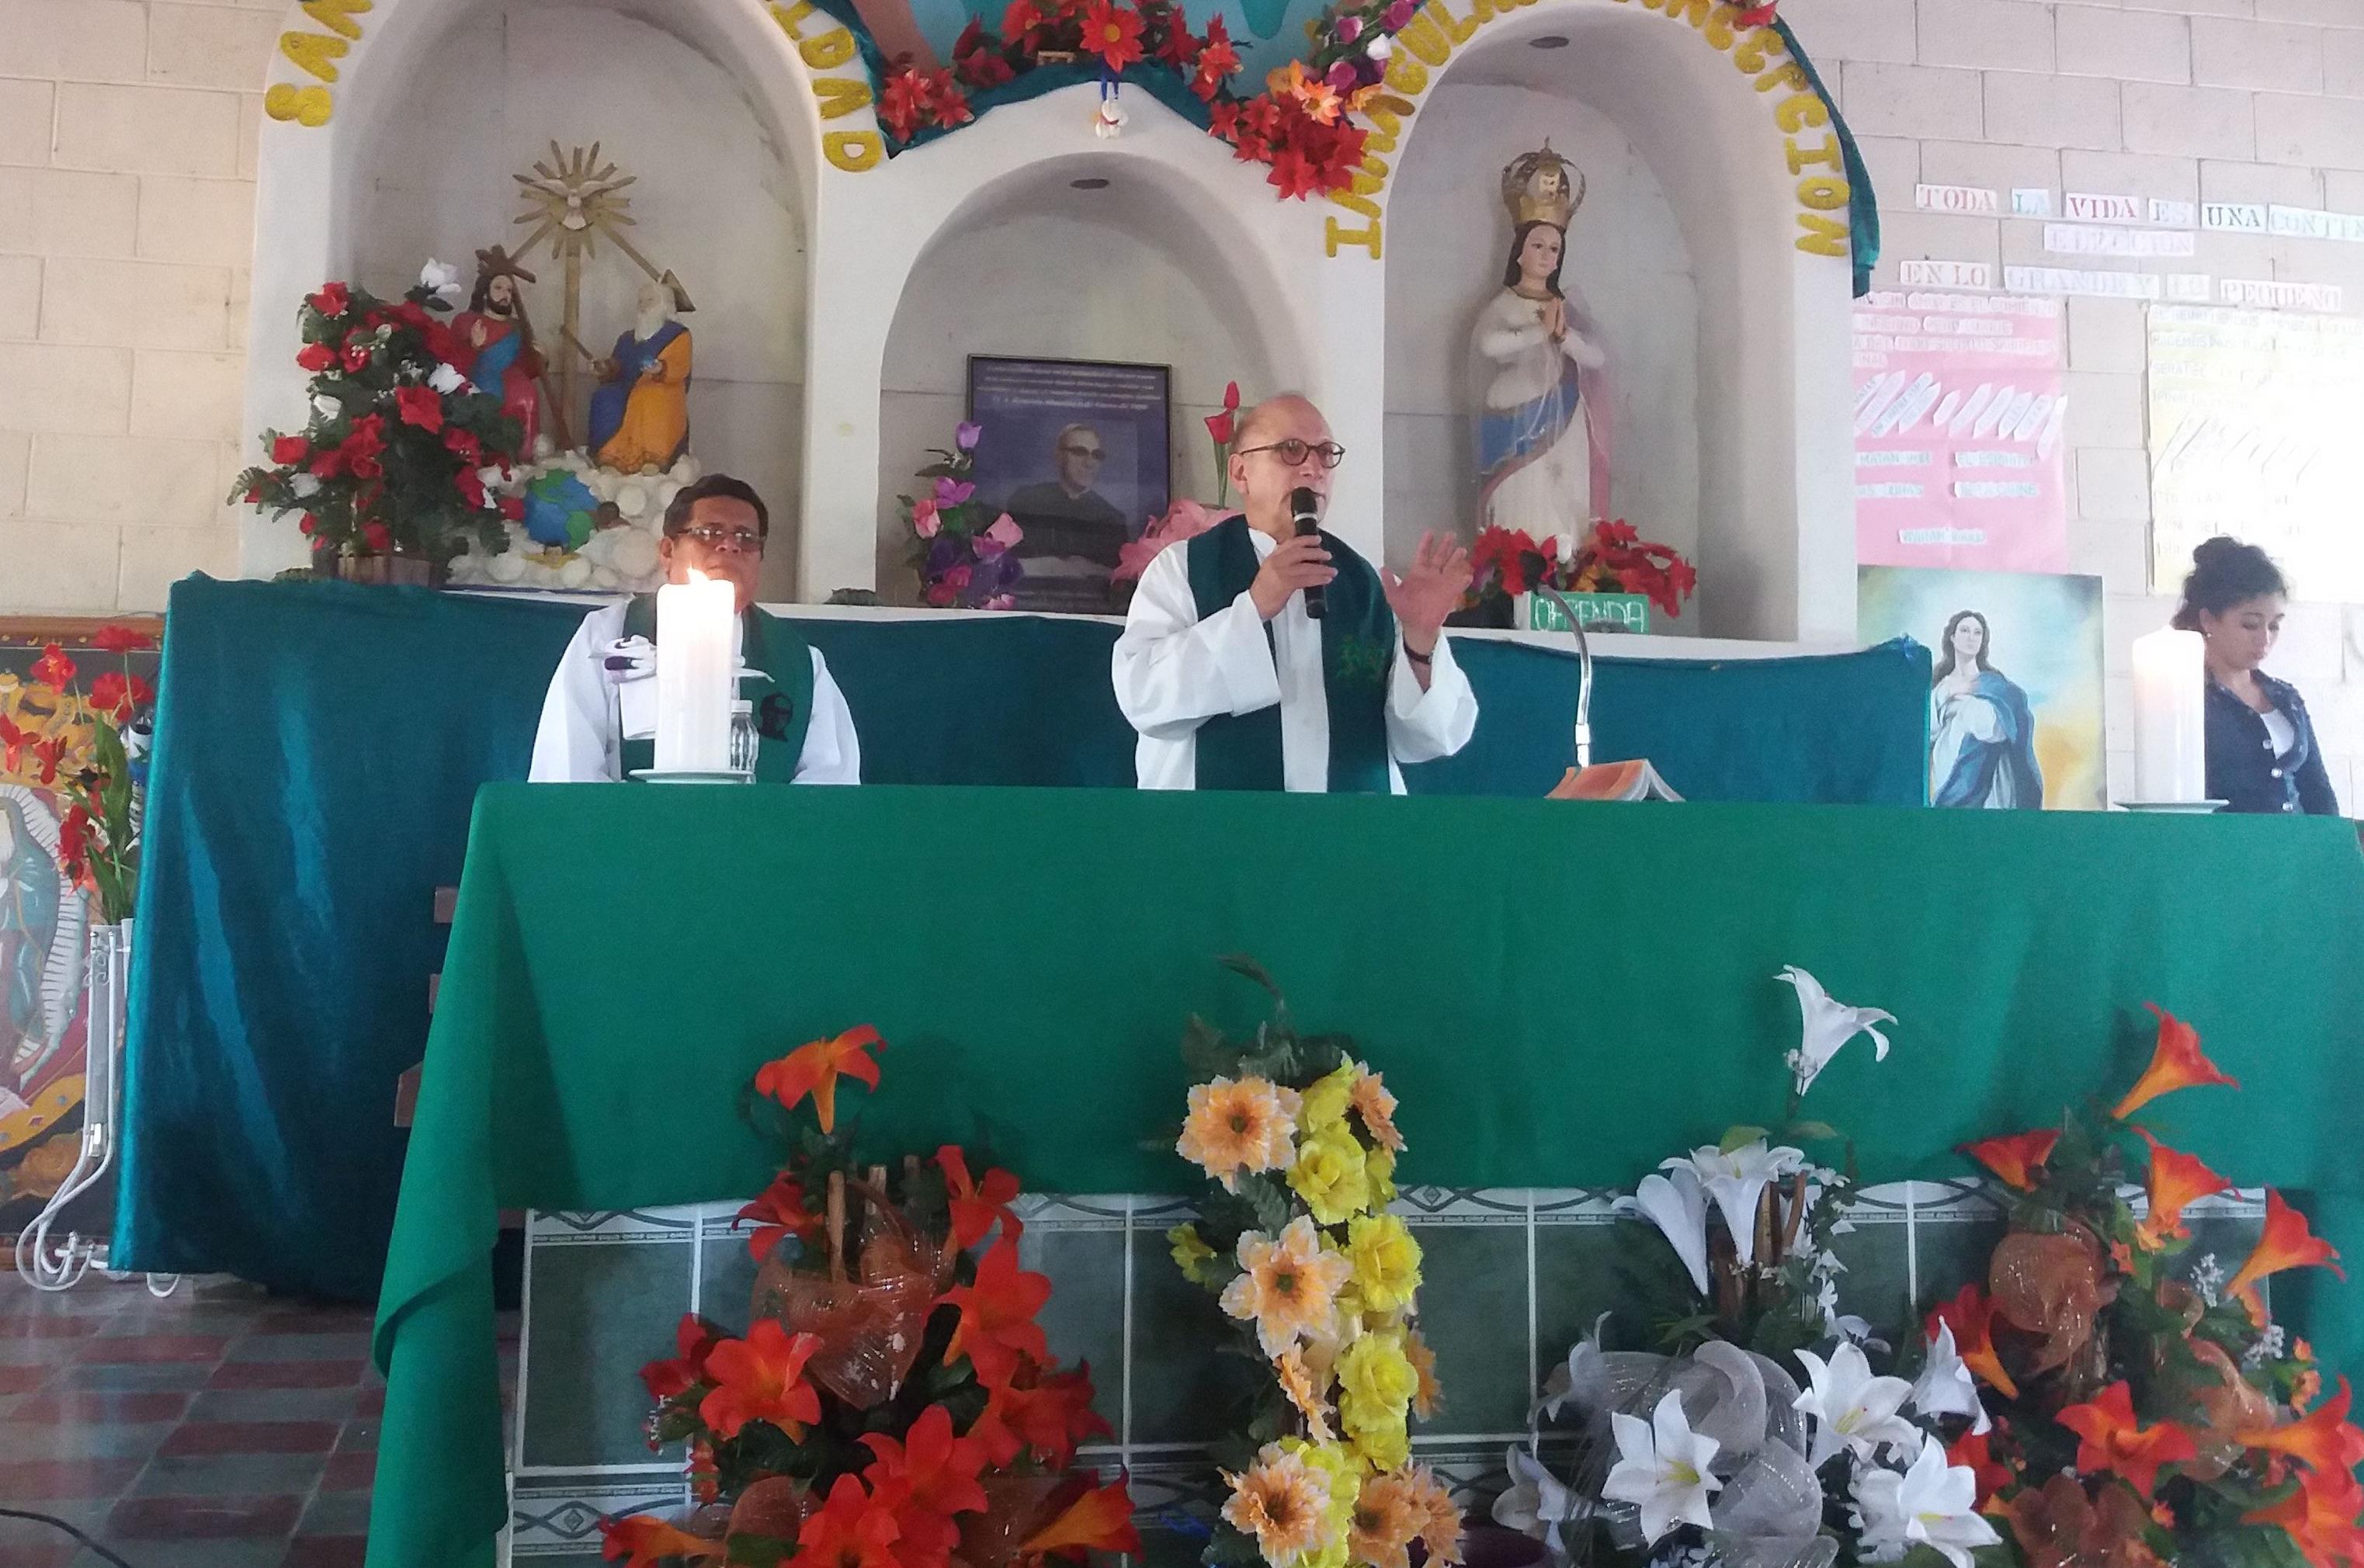 Jesuit missionary recalls Tim Kaine's mission work in